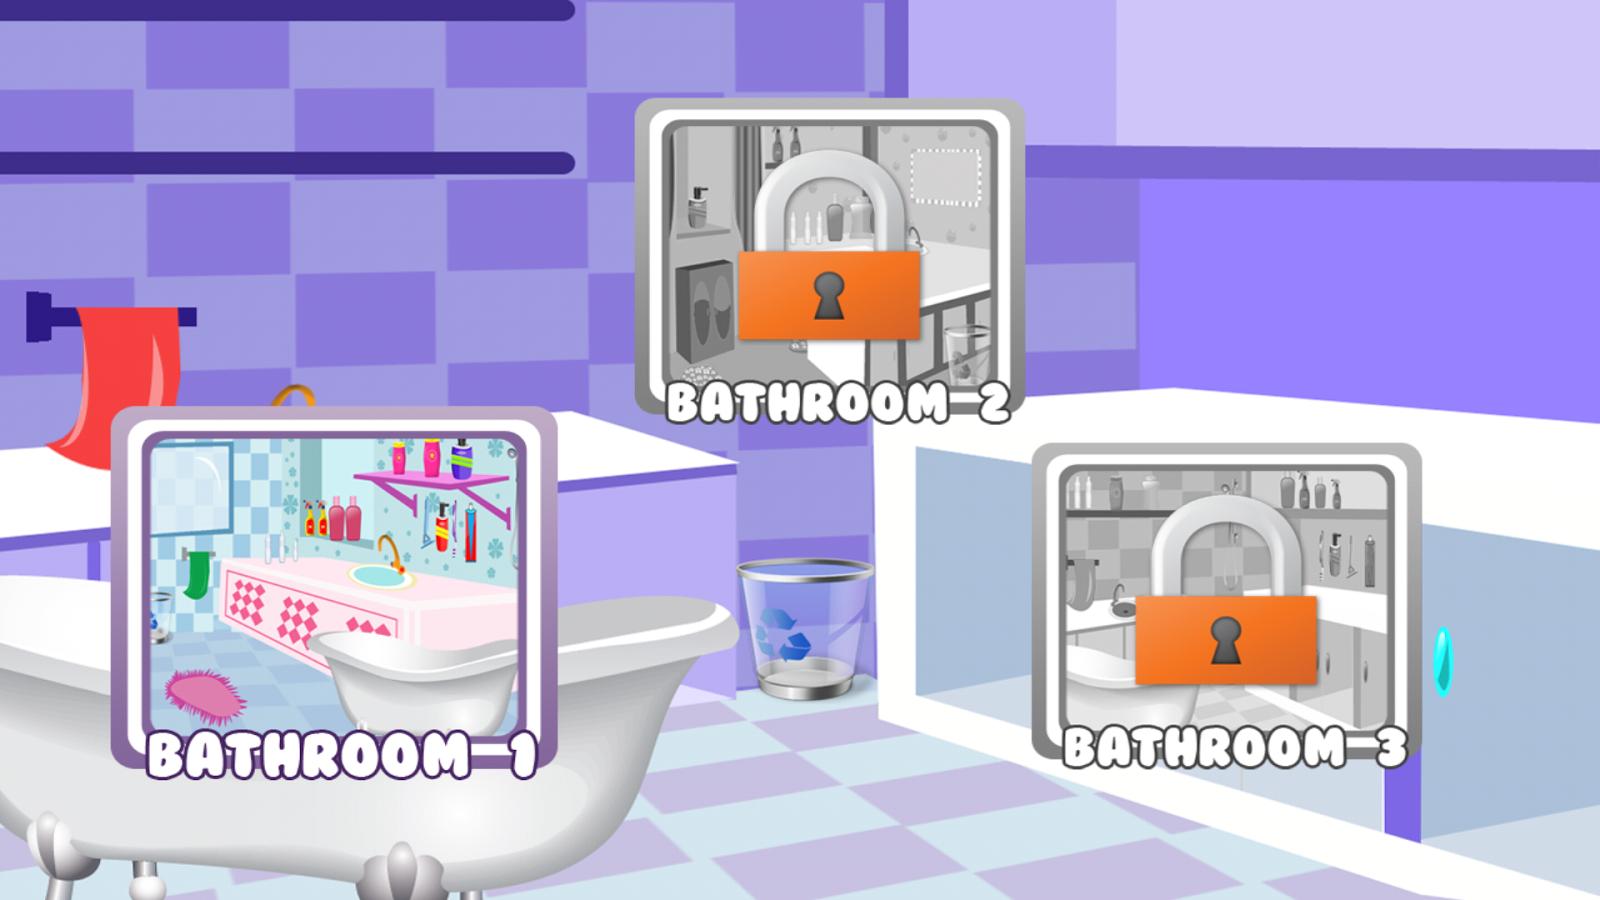 Clean up bathroom games - Cleaning Games Screenshot